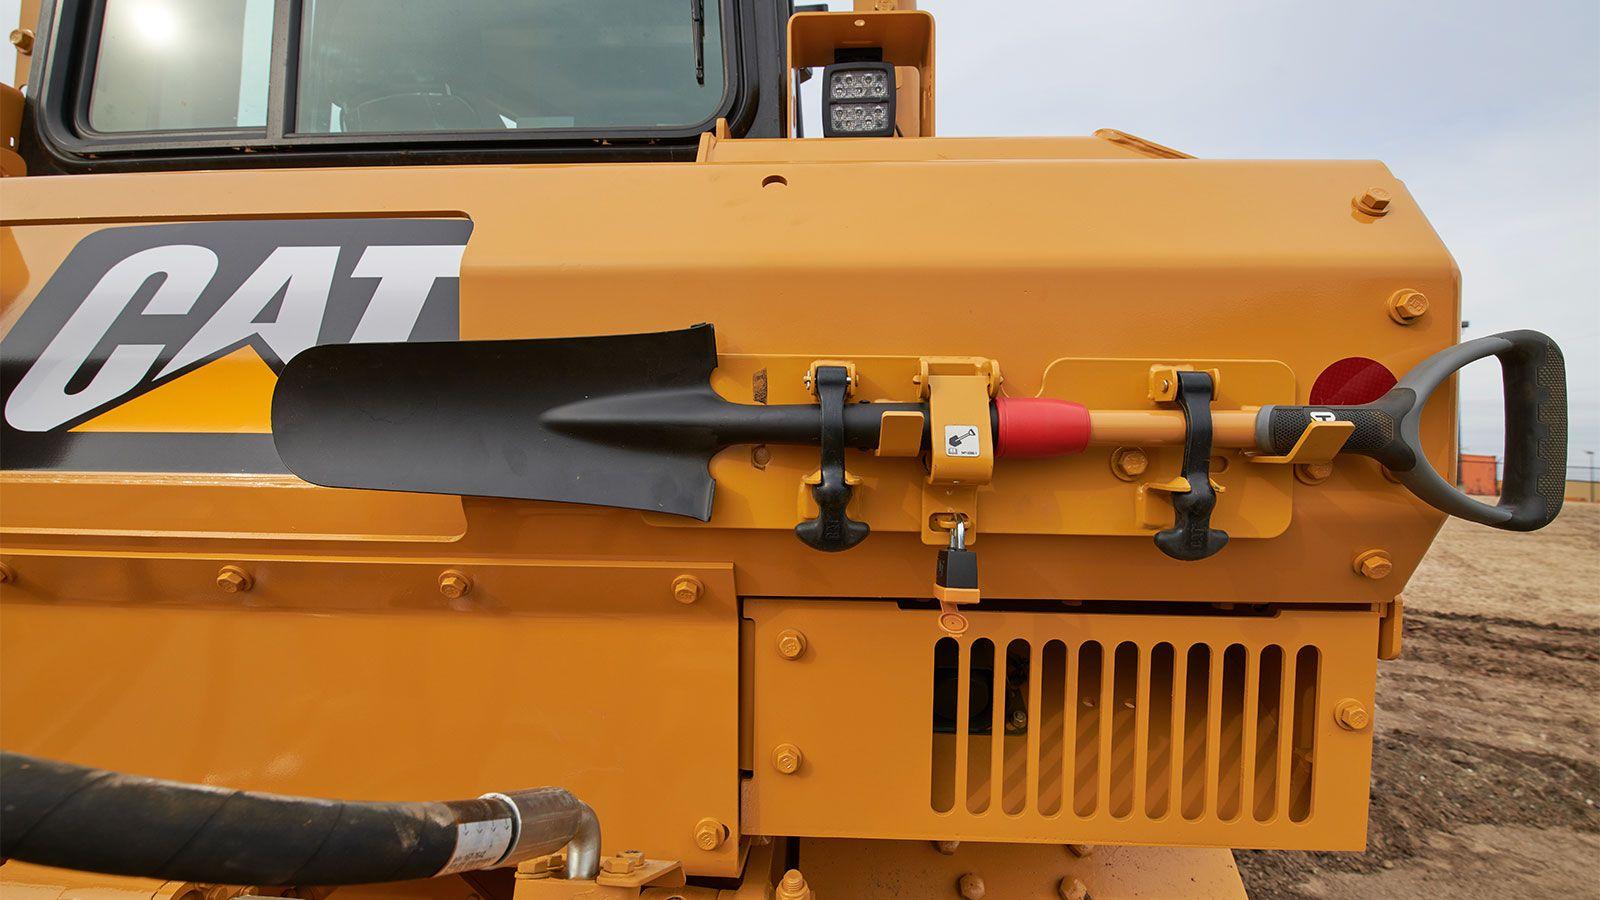 Track spade and holder kit upgrade